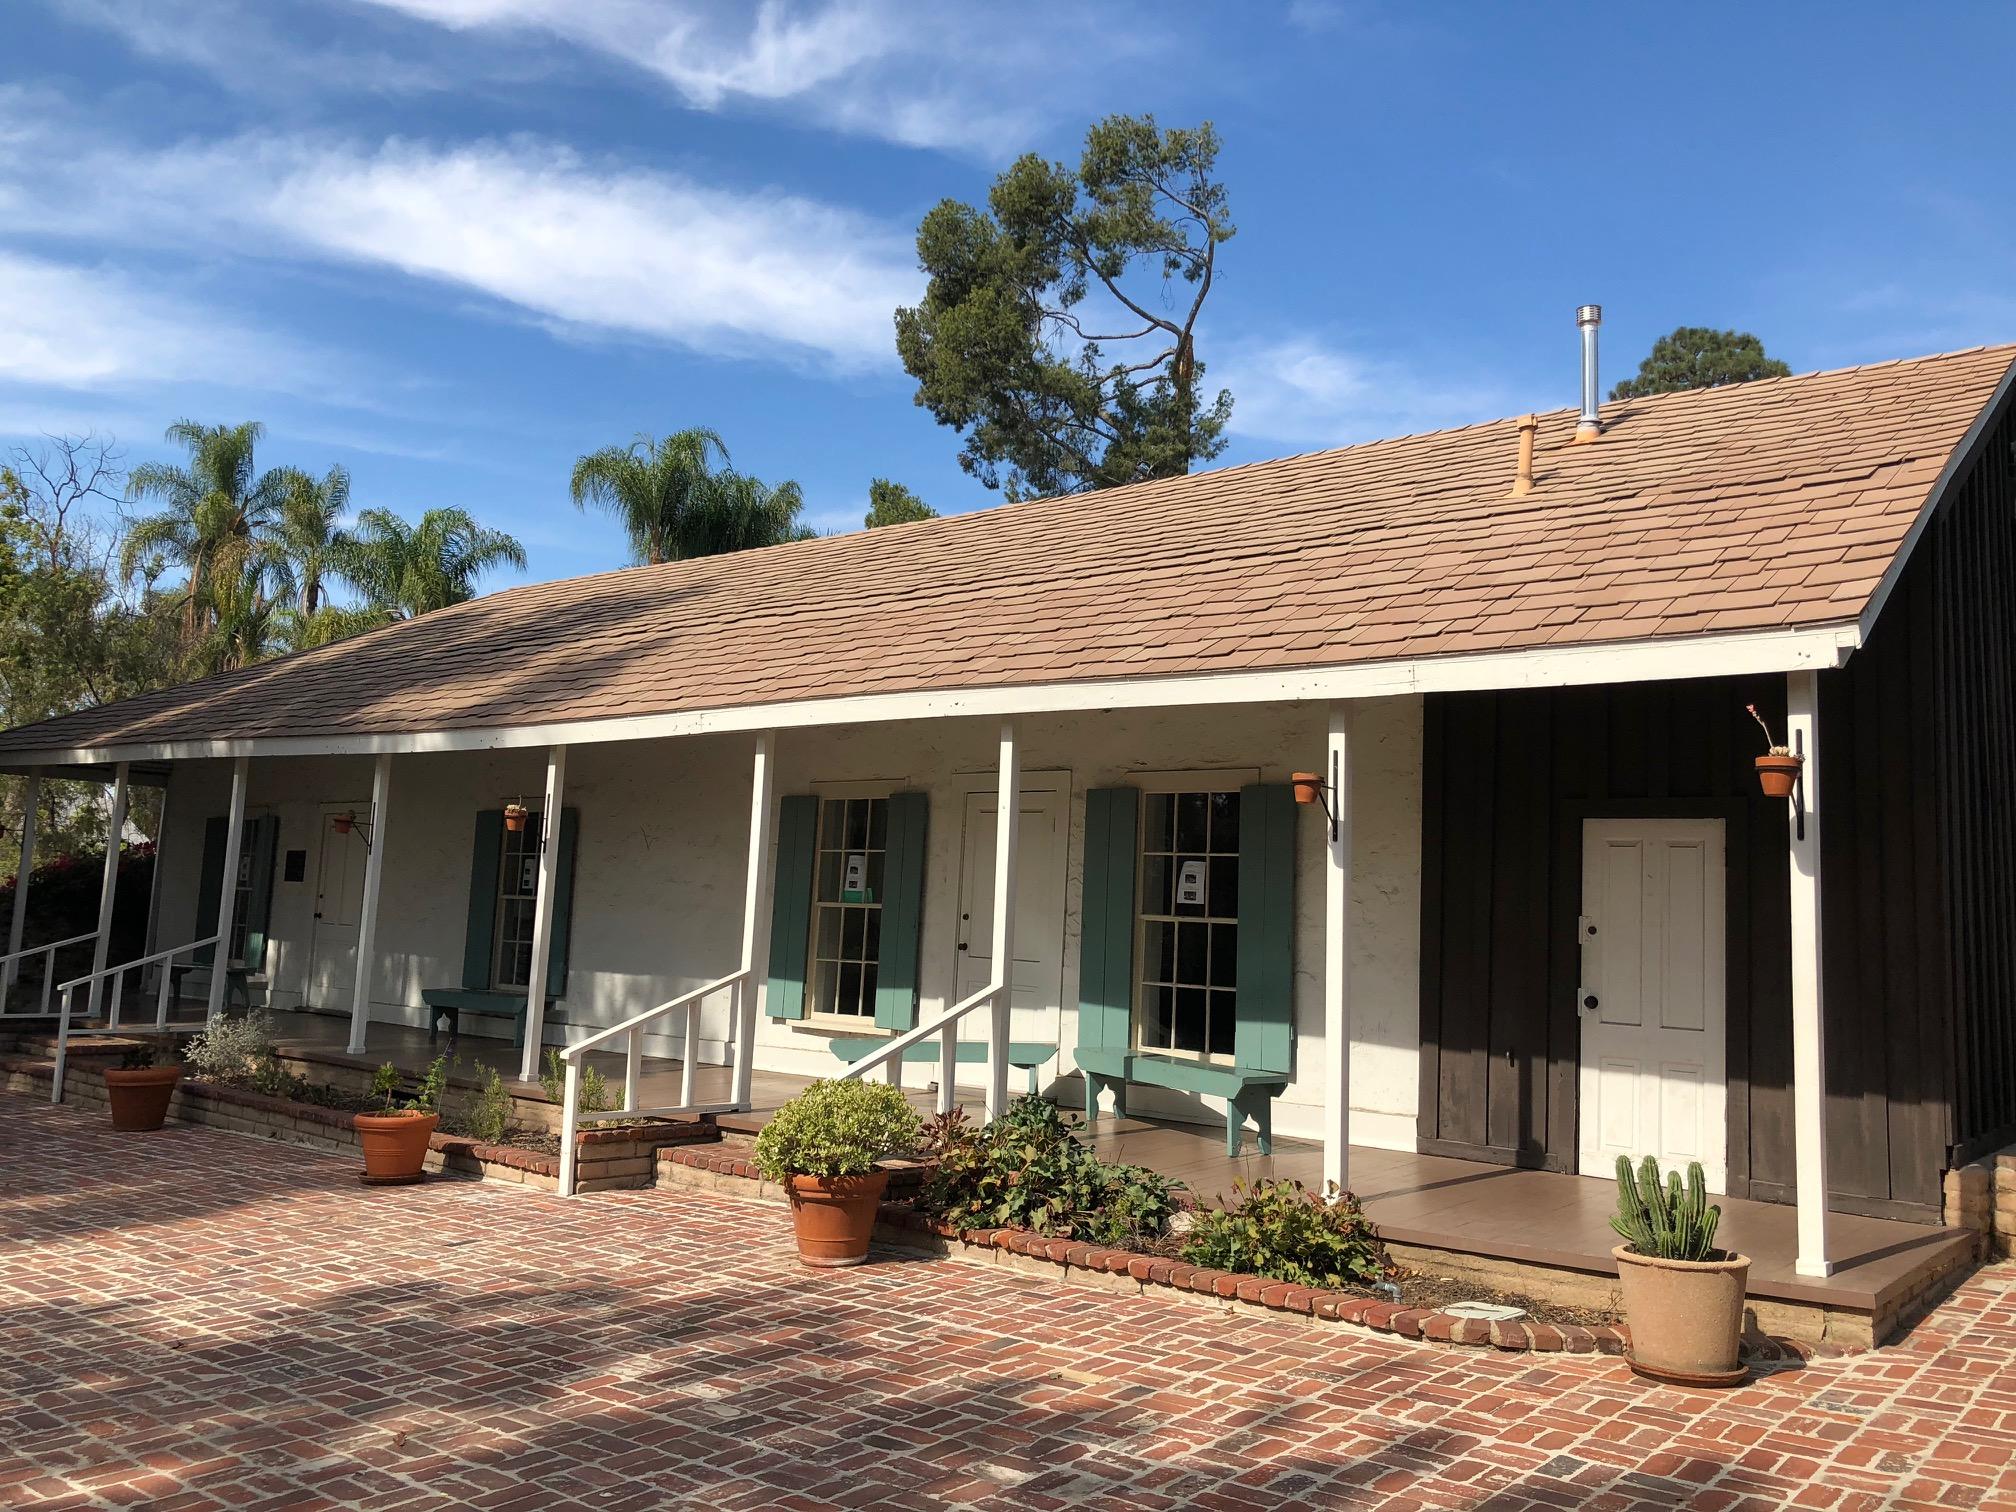 Casa Adobe San Rafael.jpg